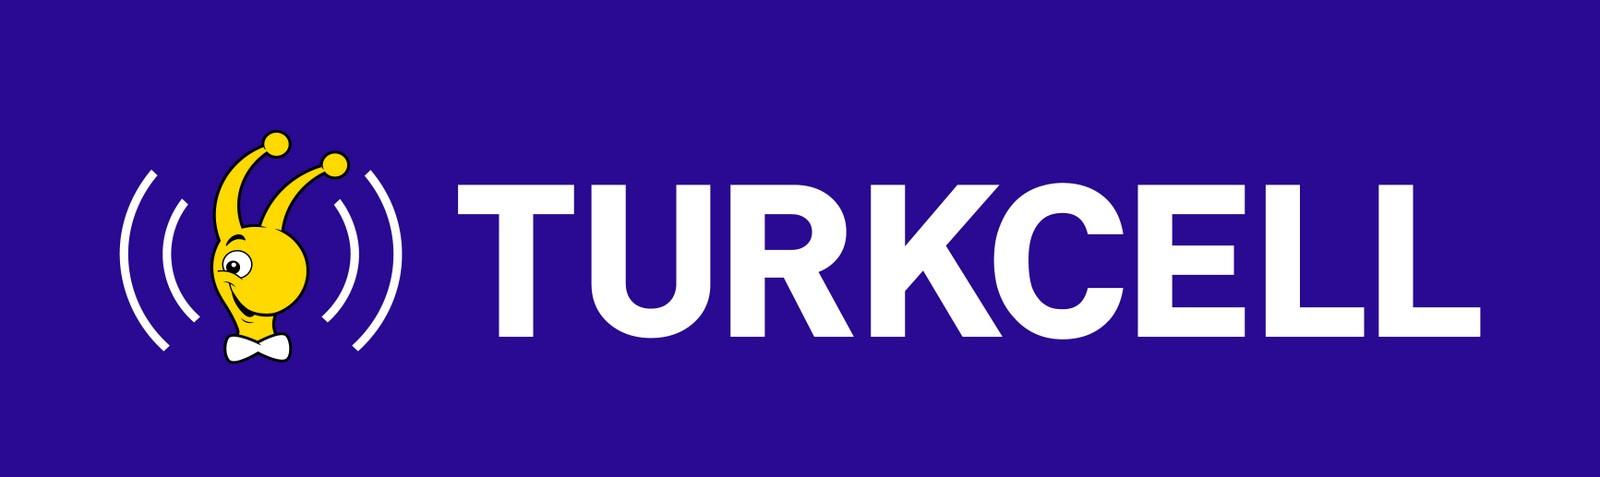 1370812914_turkcella.jpg